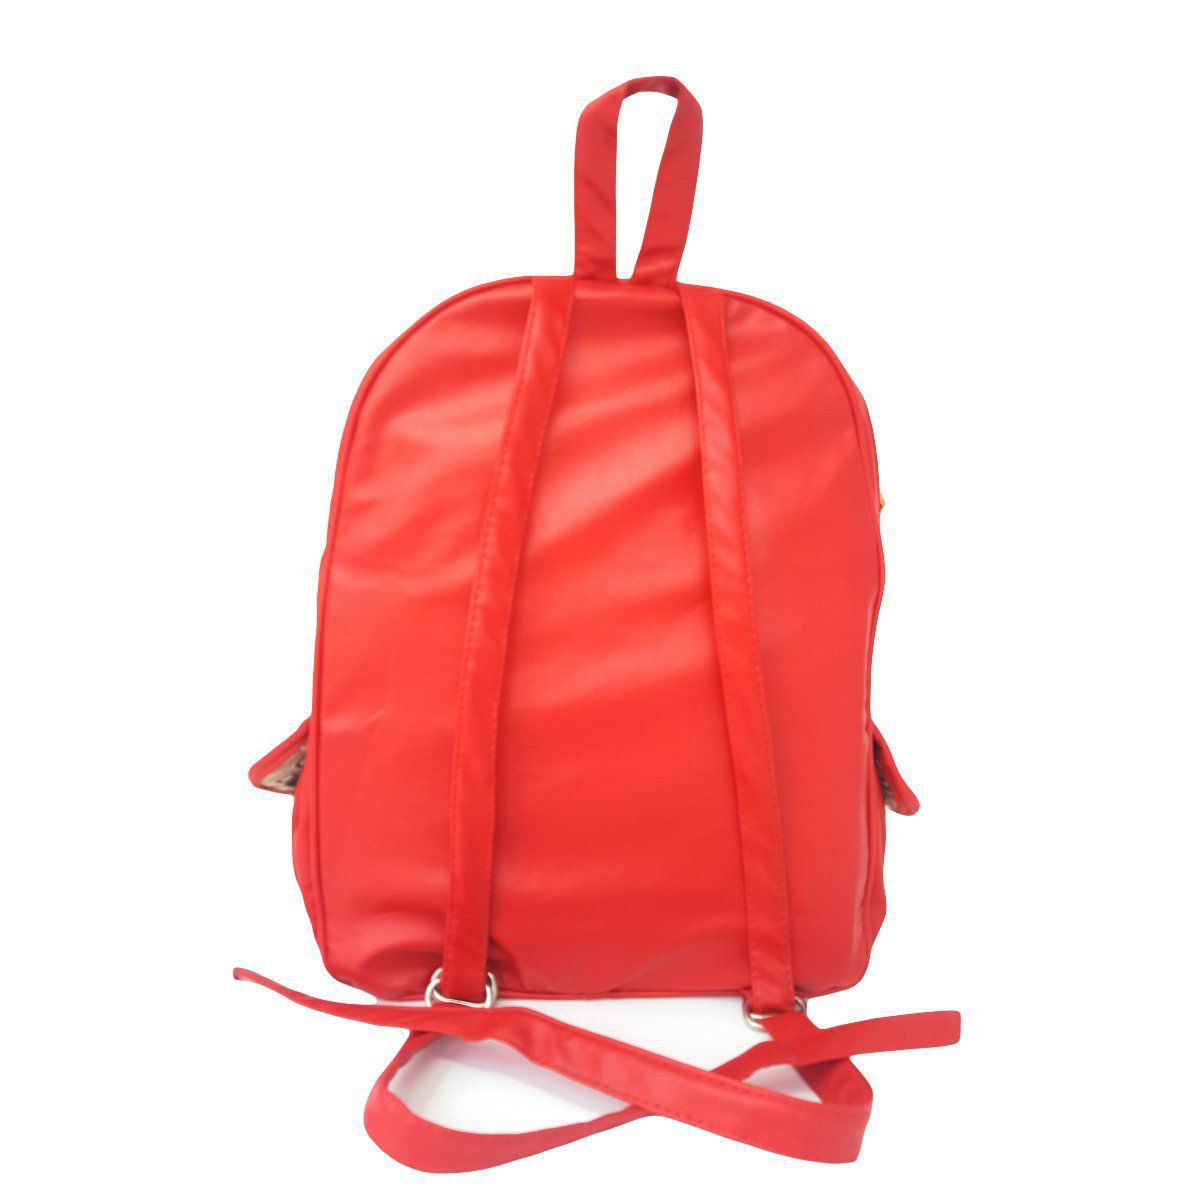 c1d0bf2805e Stylish Girls School bag College Bag Studded Women's & Girls Backpack  Handbags